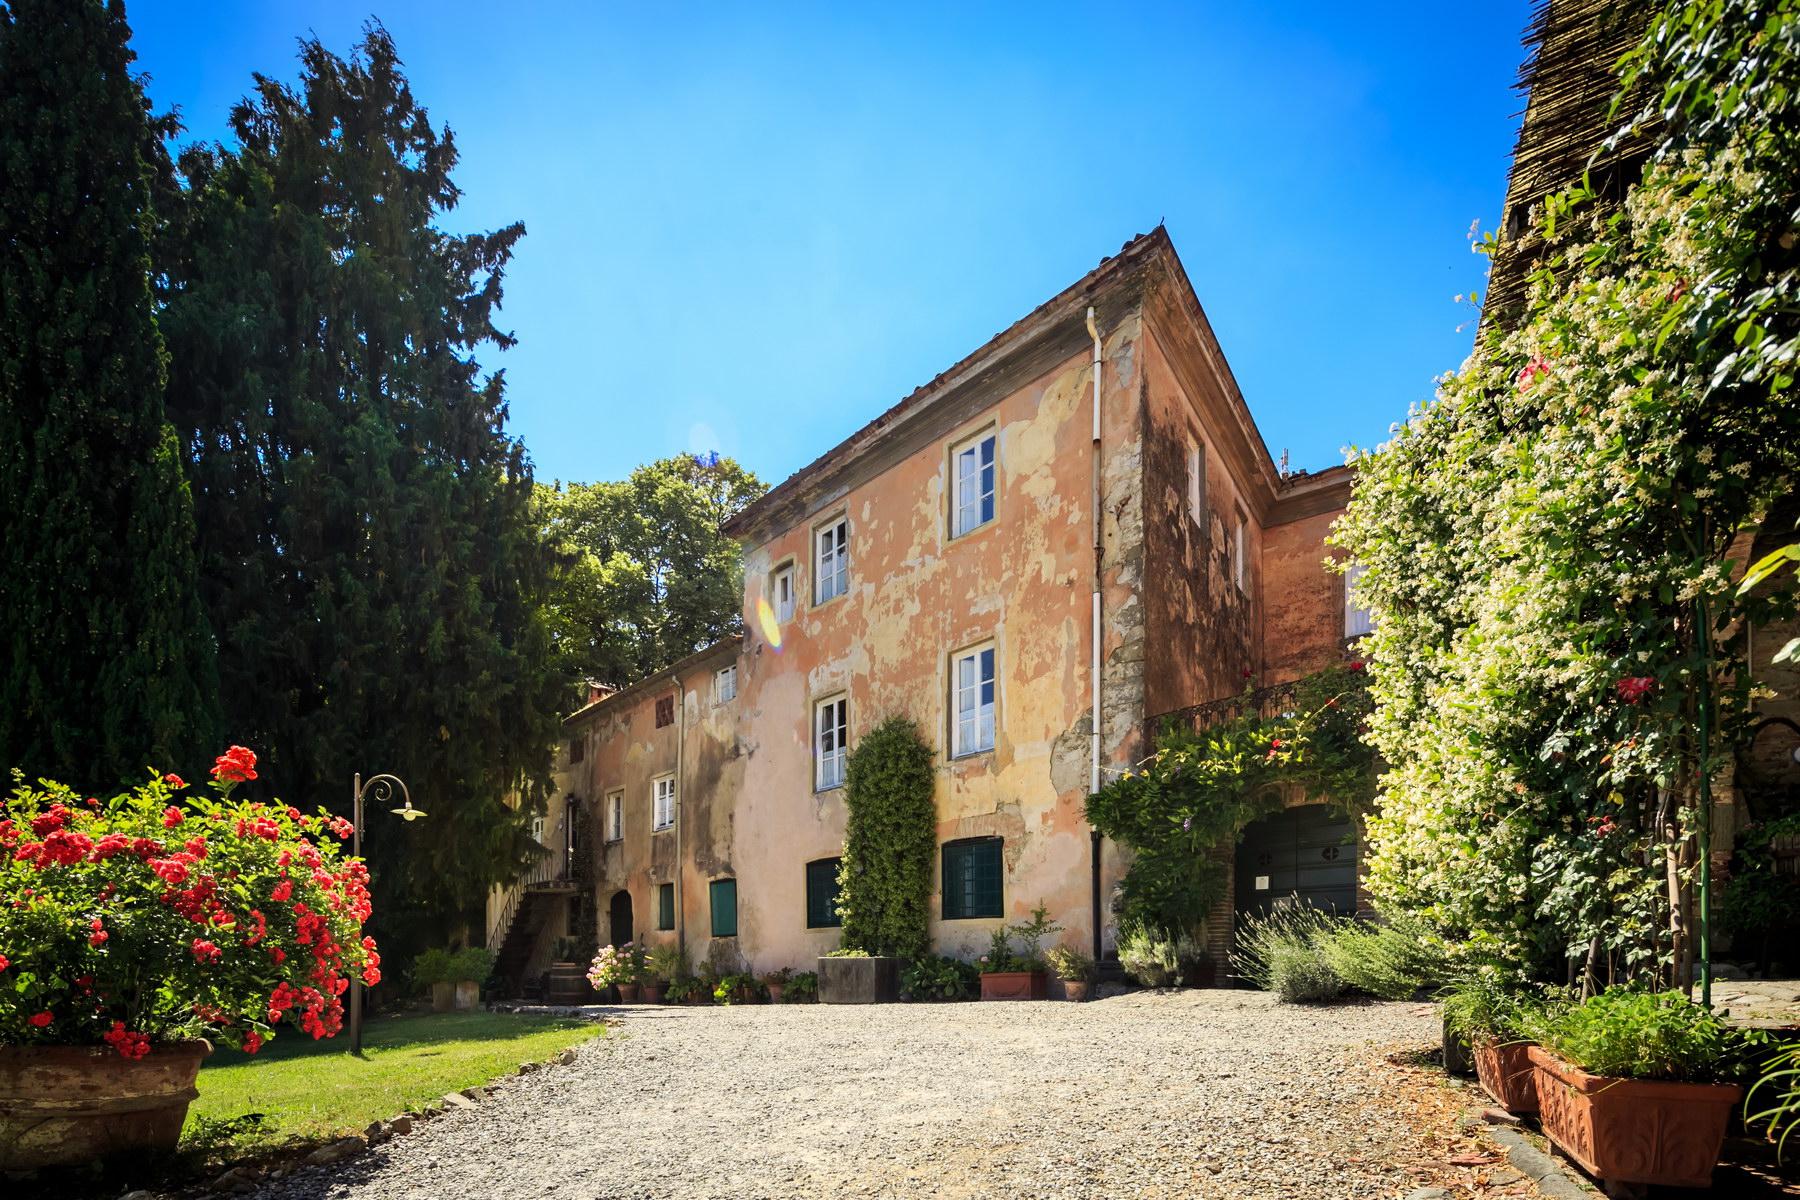 Villa in Vendita a Capannori: 5 locali, 570 mq - Foto 26